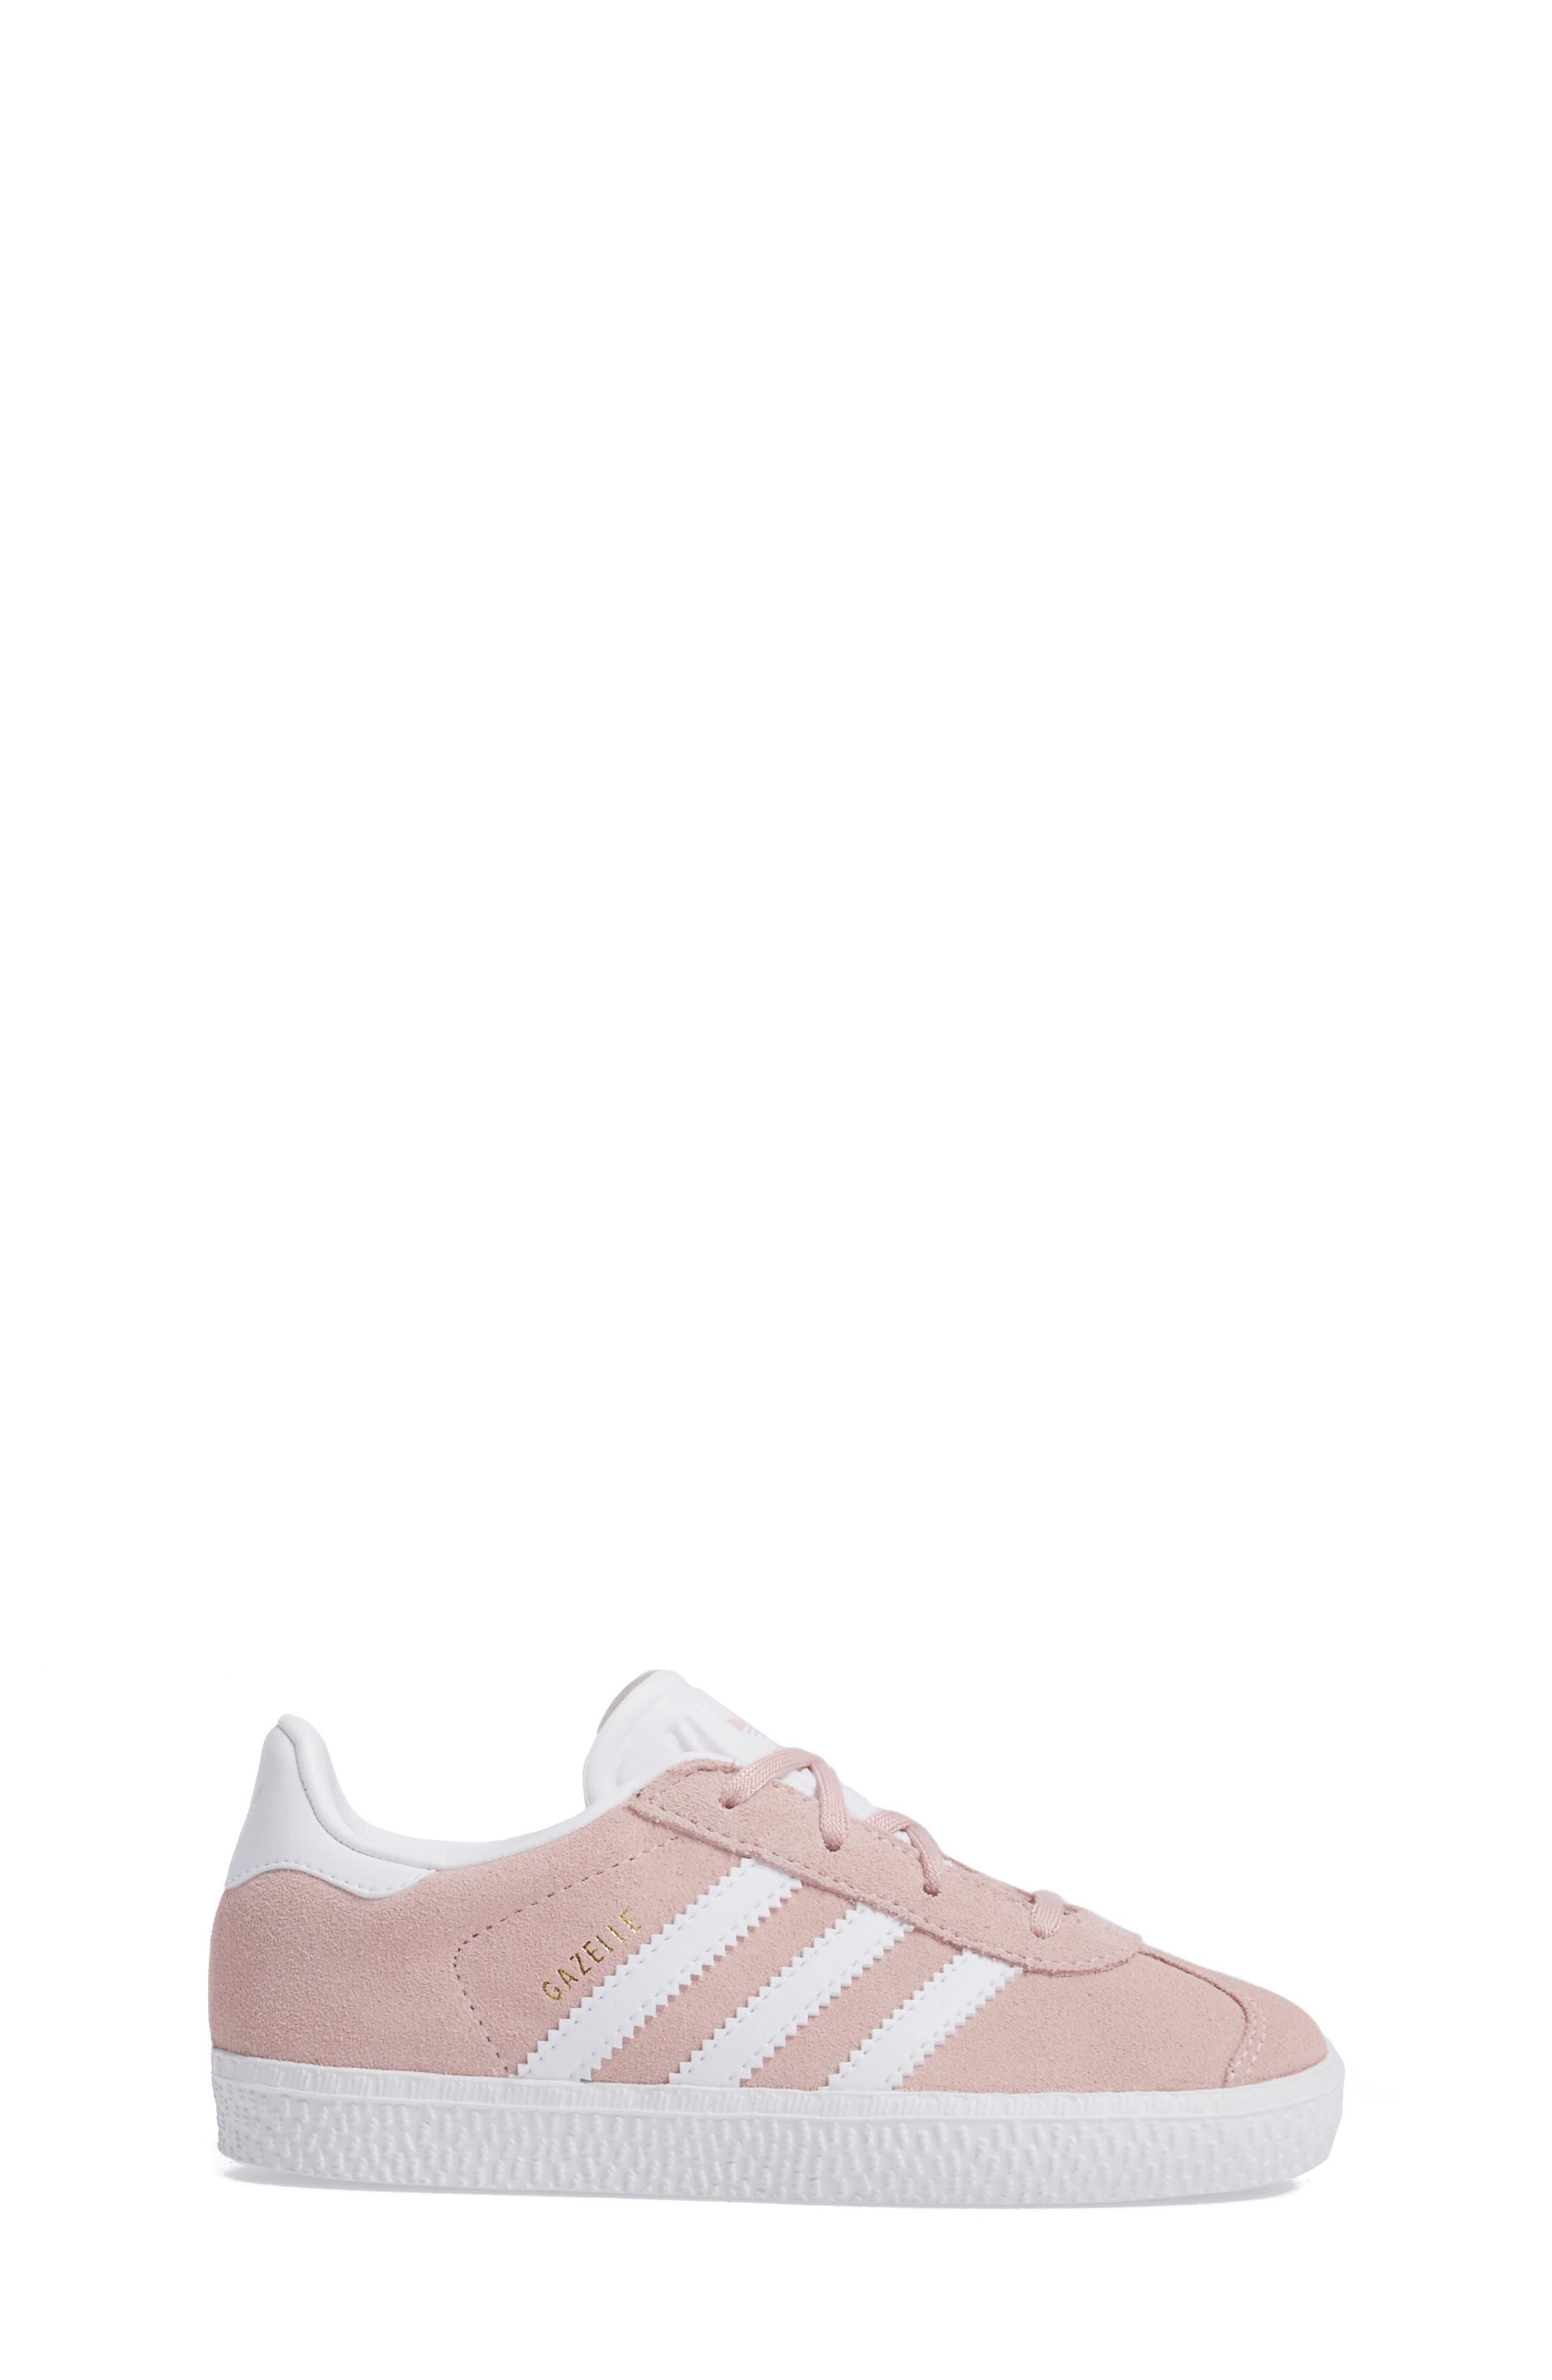 ADIDAS, Gazelle Sneaker, Alternate thumbnail 3, color, 682